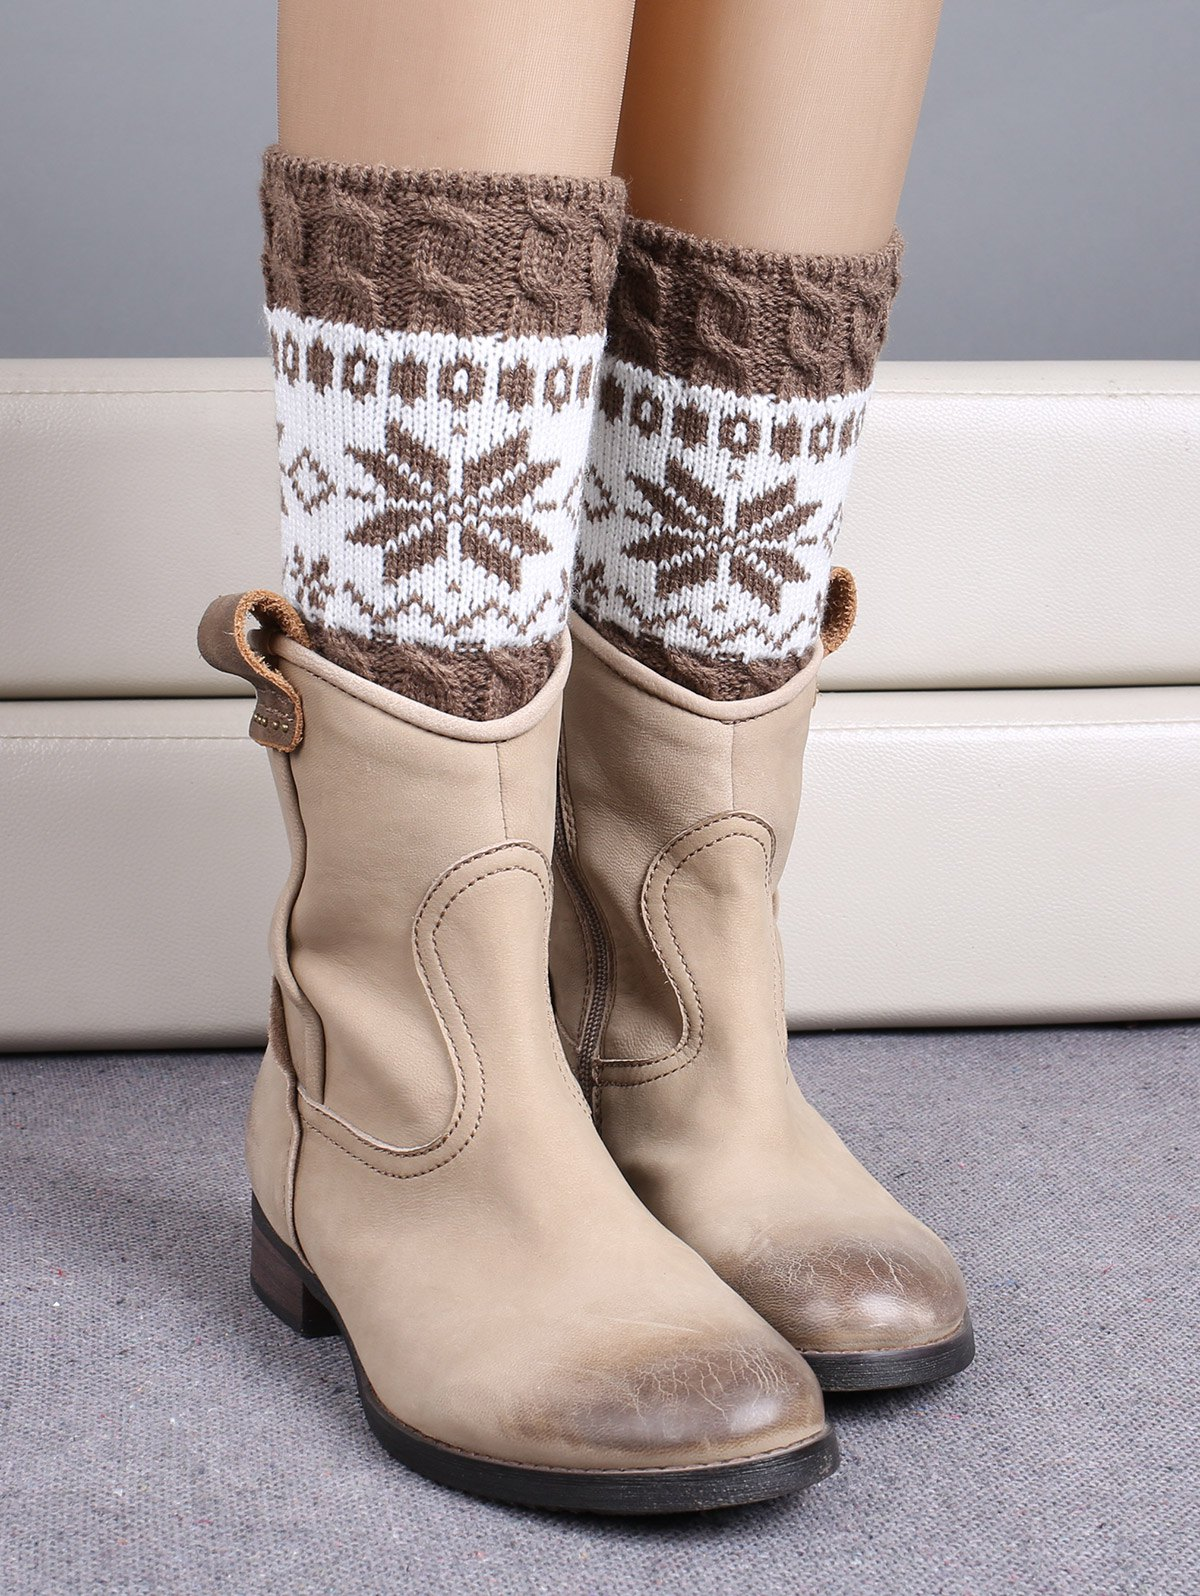 Snowflake Jacquard Christmas Boot Cuffs